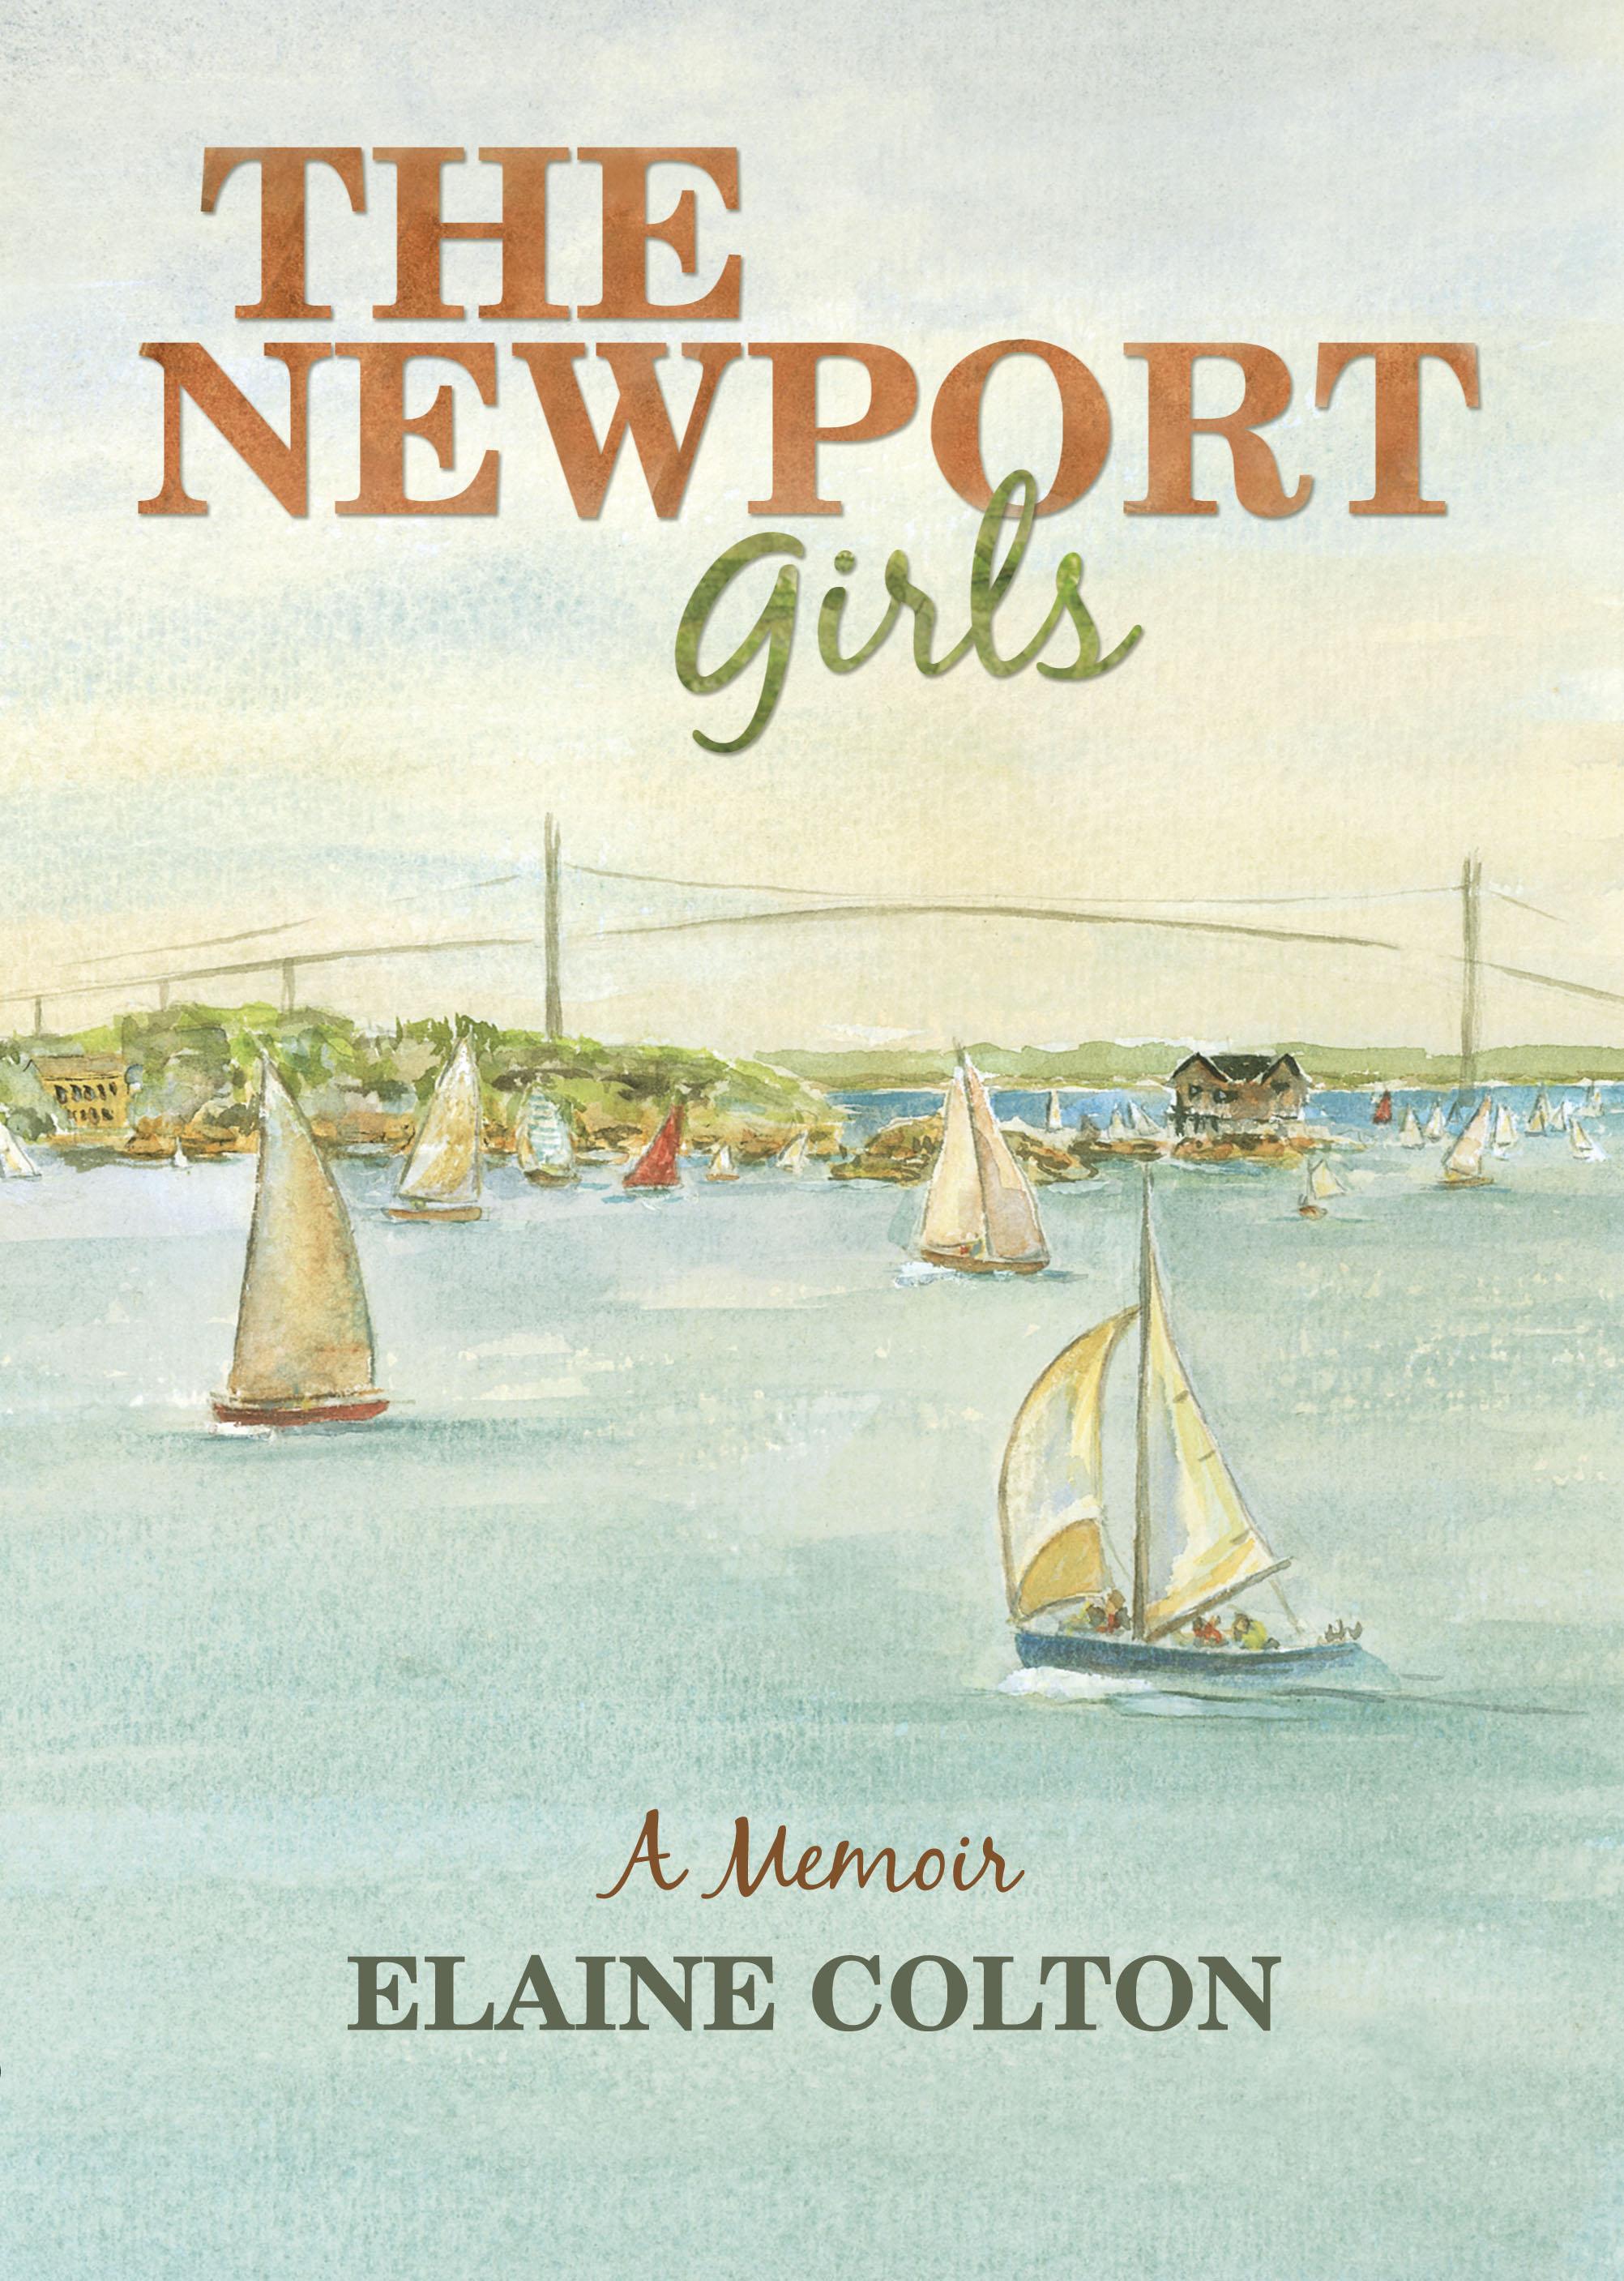 newport girls book cover